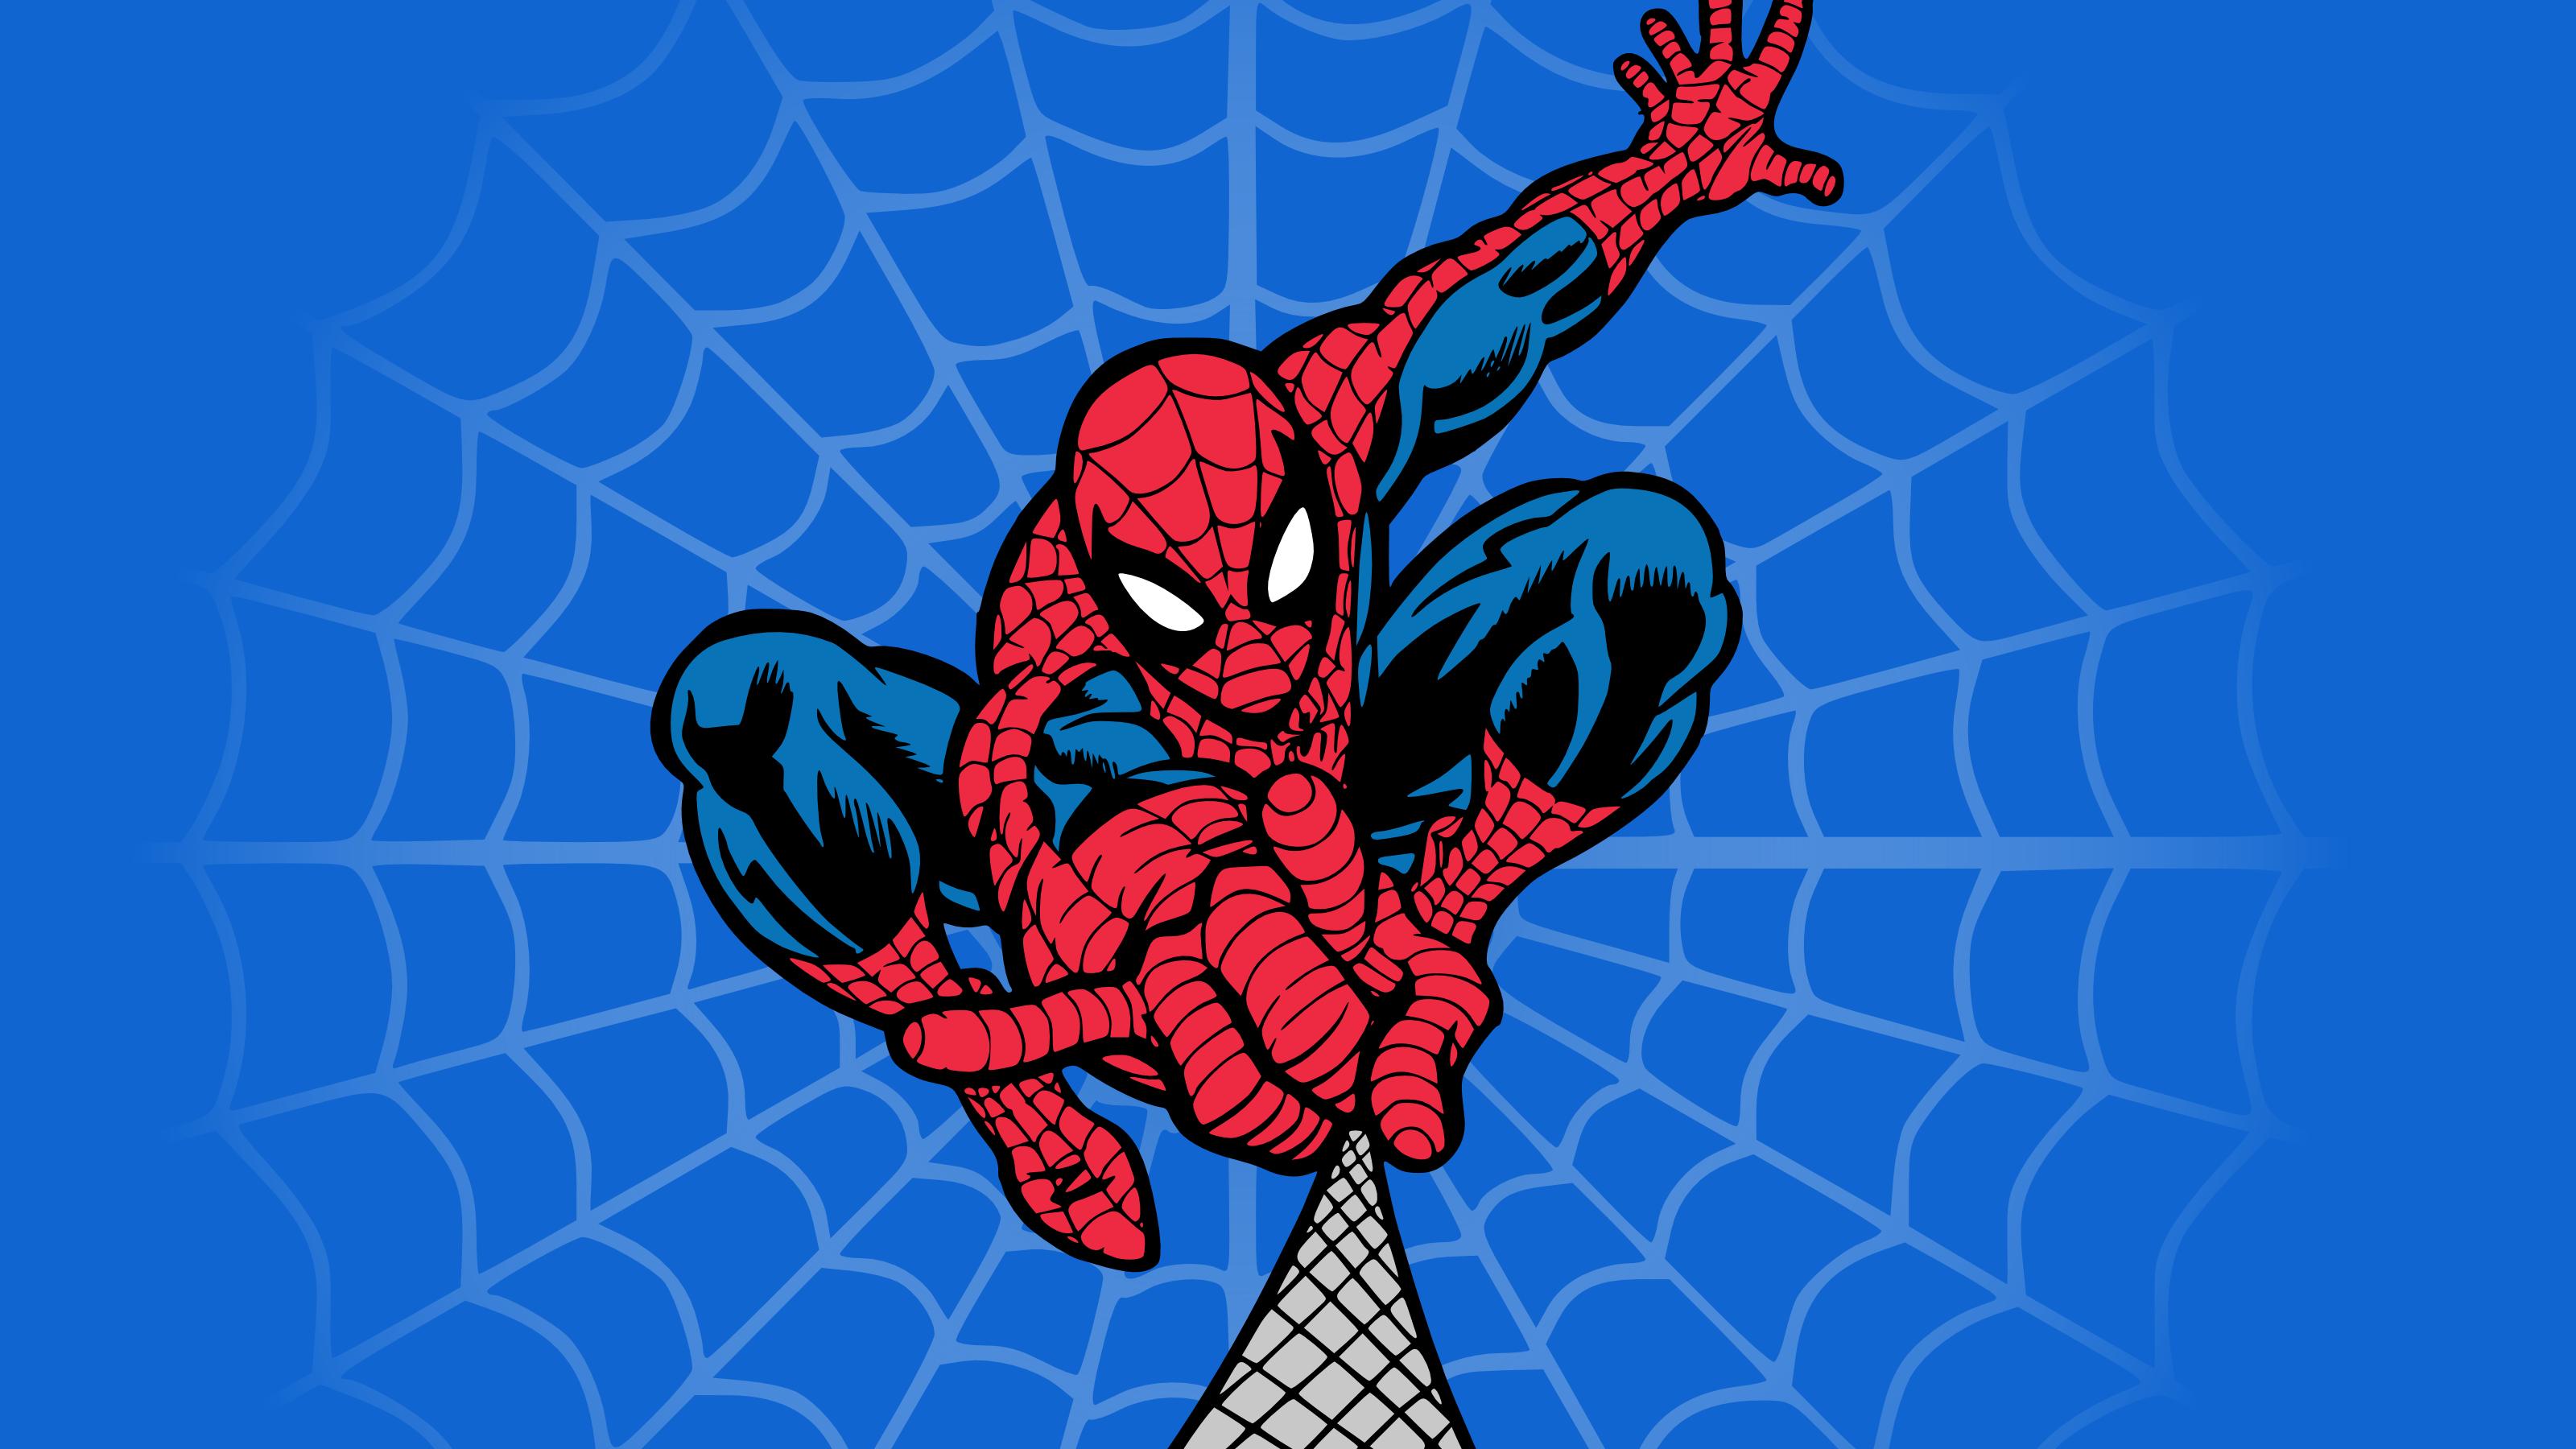 Spiderman comics spider man superhero wallpaper 3200x1800 39506 3200x1800